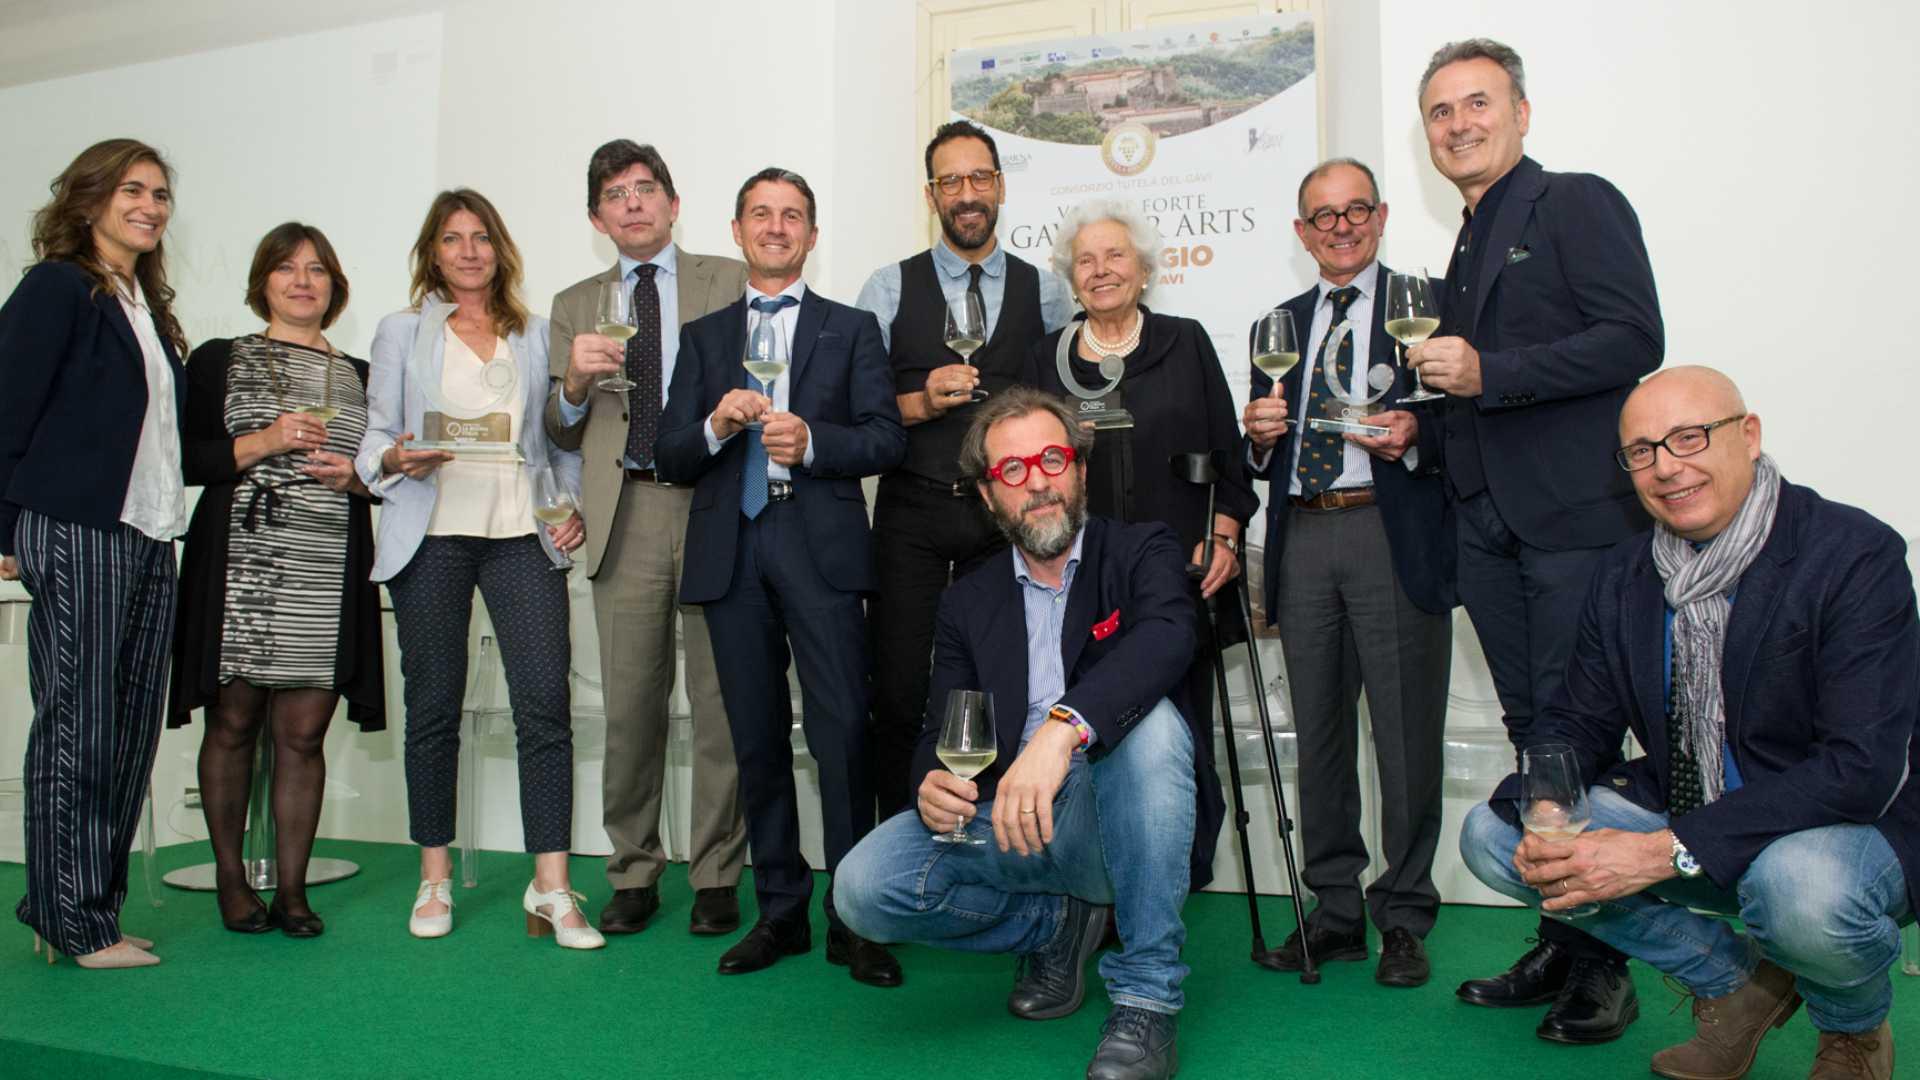 Premio Gavi La Buona Italia 2017